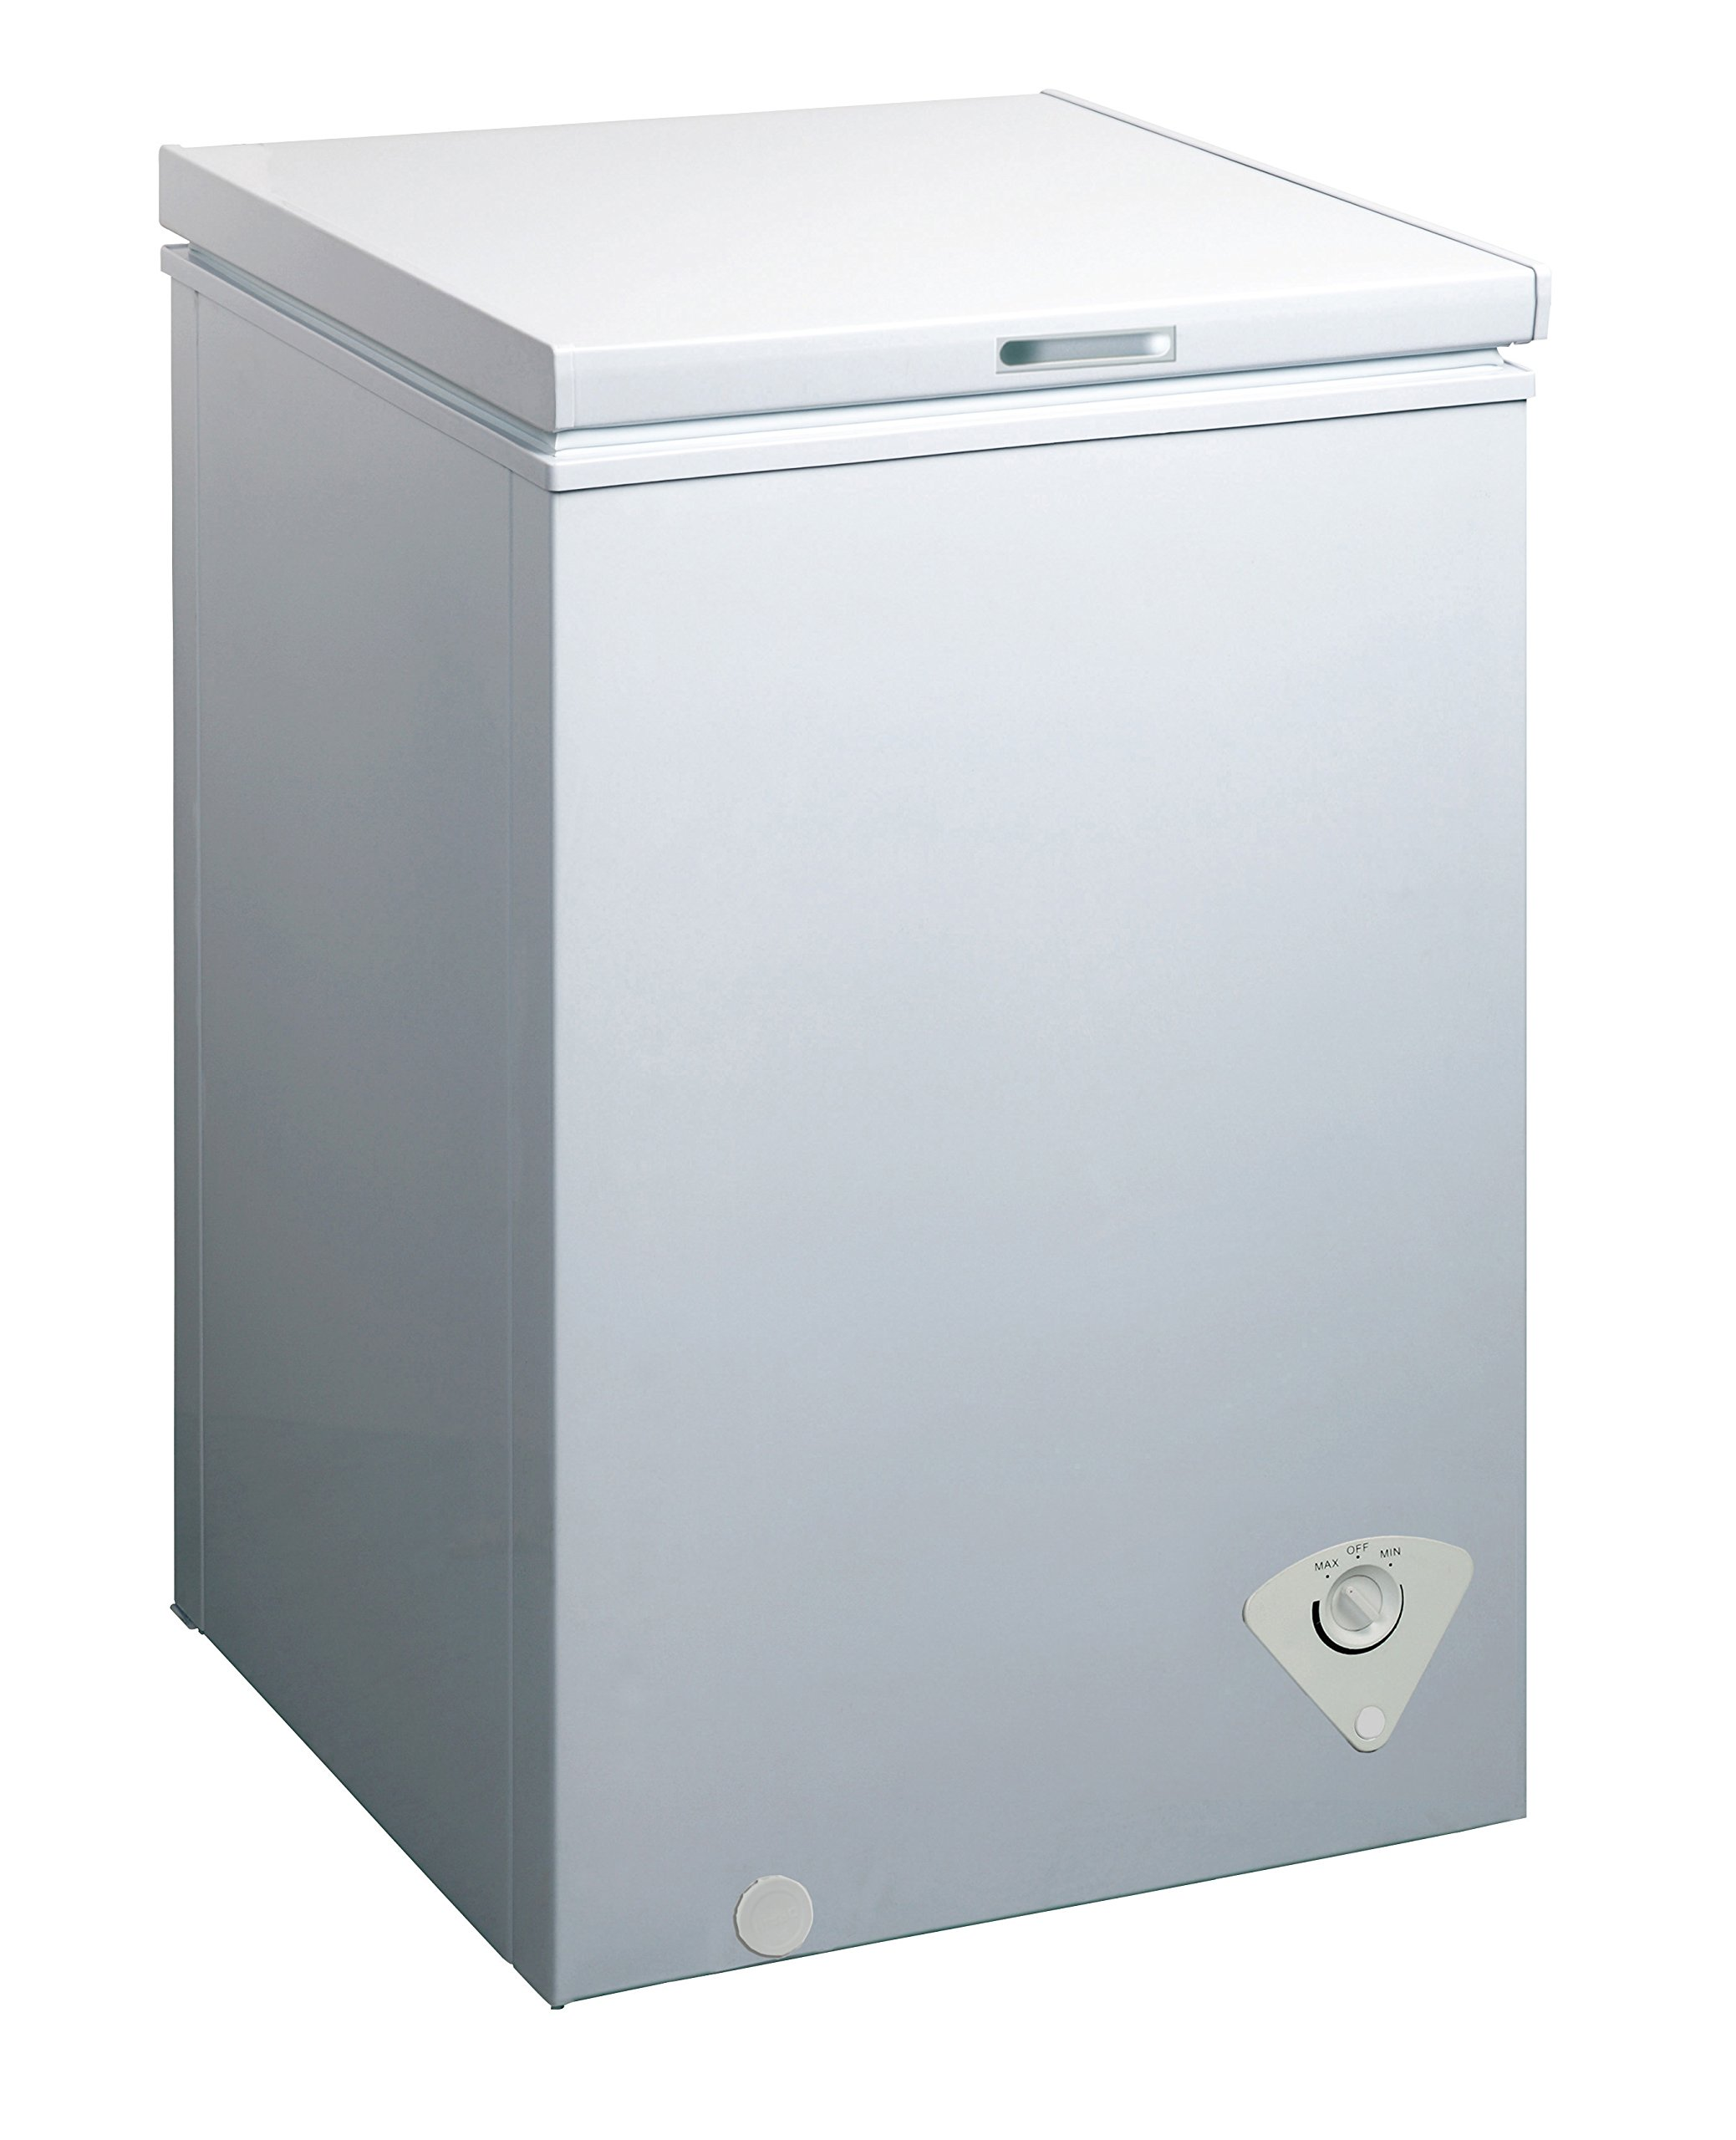 midea WHS-129C1 Single Door Chest Freezer, 3.5 Cubic Feet, White by MIDEA